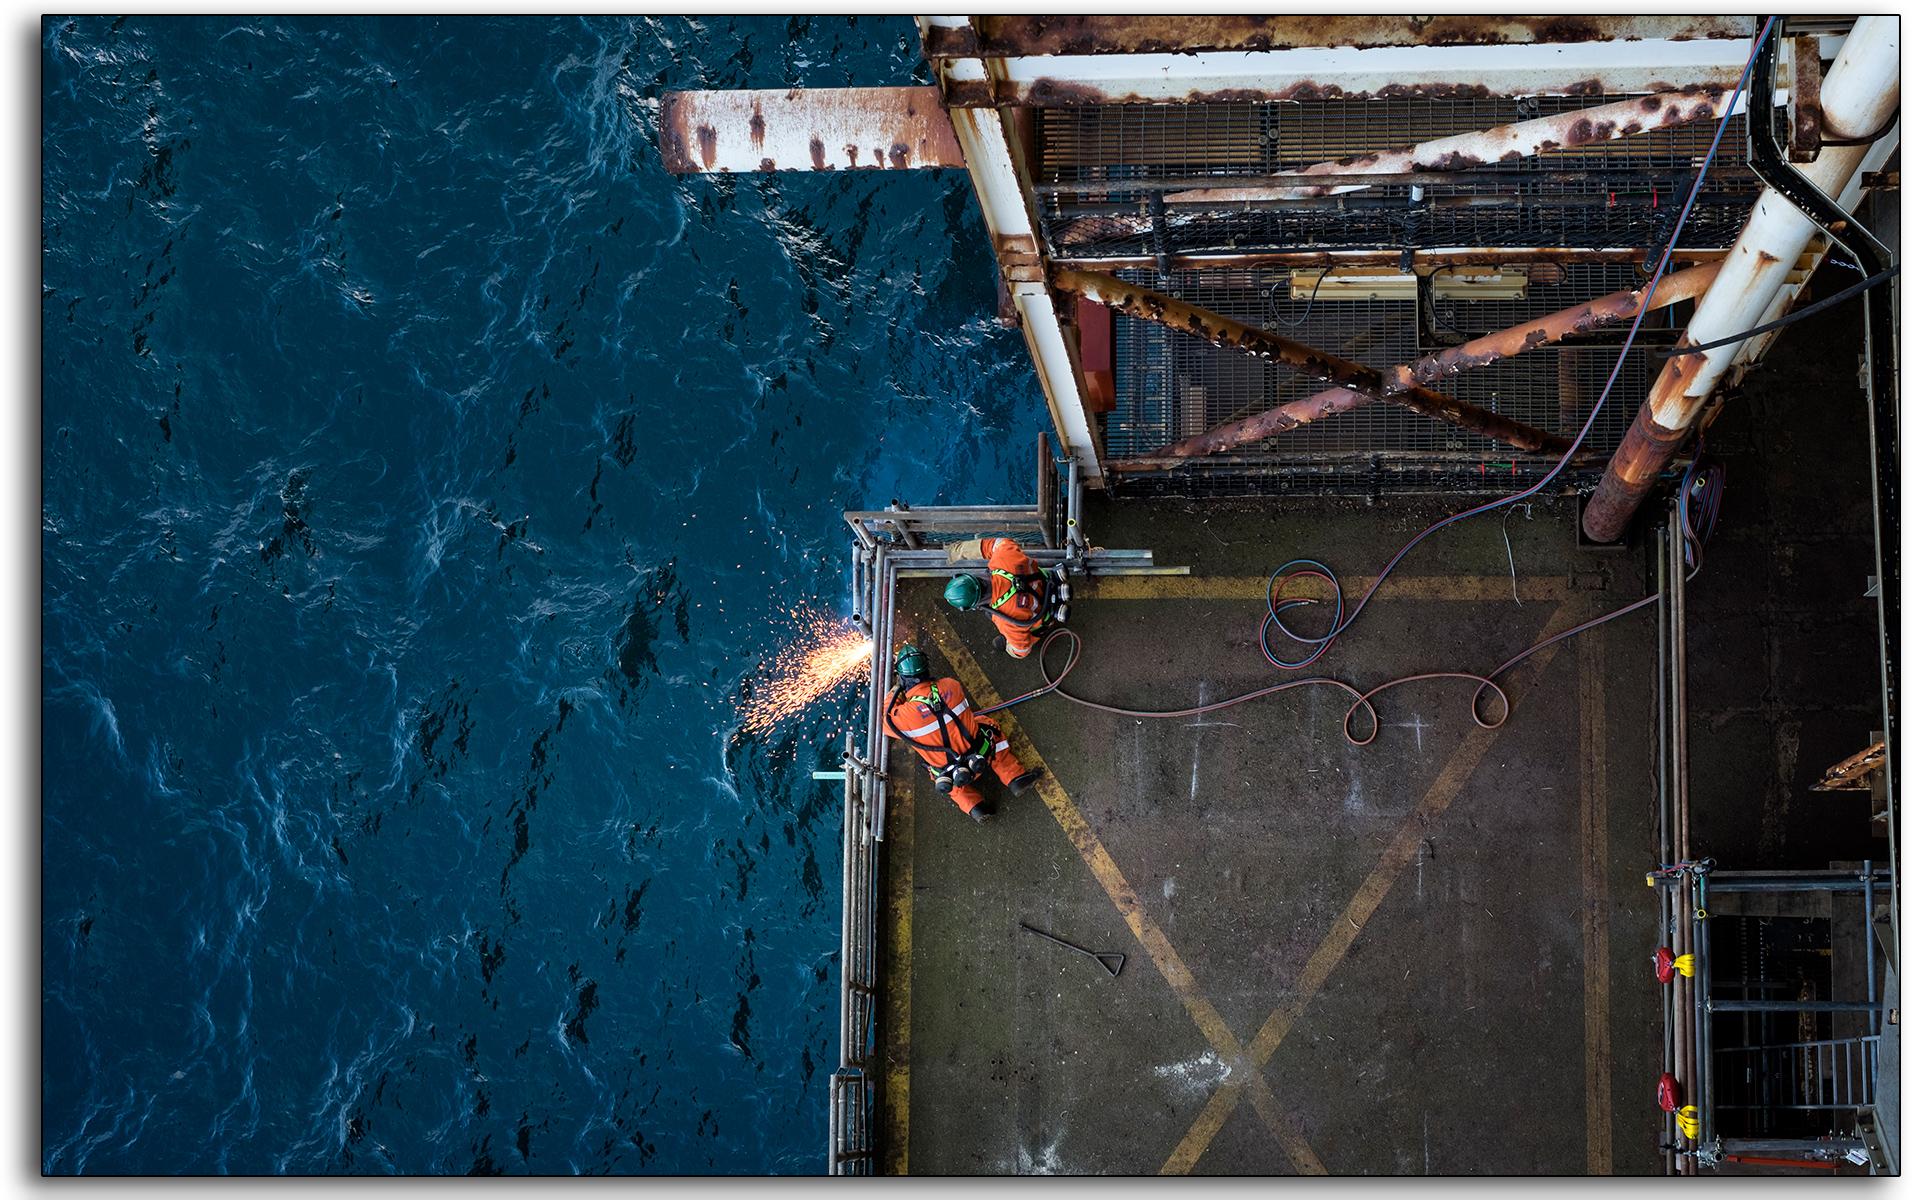 Rig burning, welding, oxygen, acetylene, cutting, BP Miller, Decommissioning, industrial, removal, Saipem, Petrofac, BP, Lee Ramsden, hotwork 01.jpg